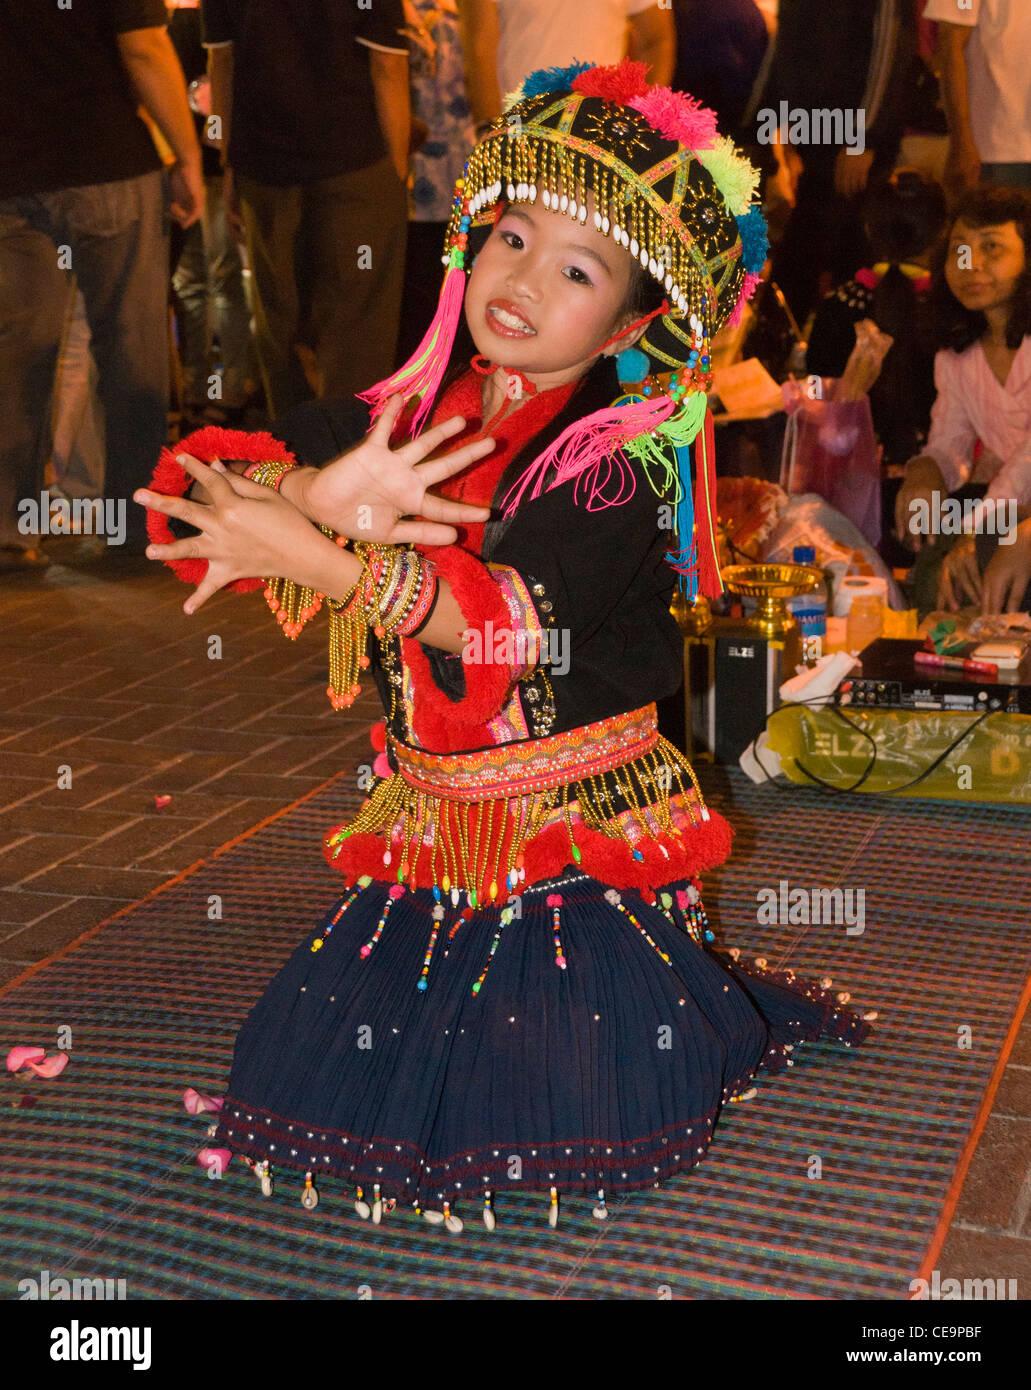 Elk208-1123v Thailand, Chiang Mai, Sunday Walking Street Market, young Hmong dancer - Stock Image